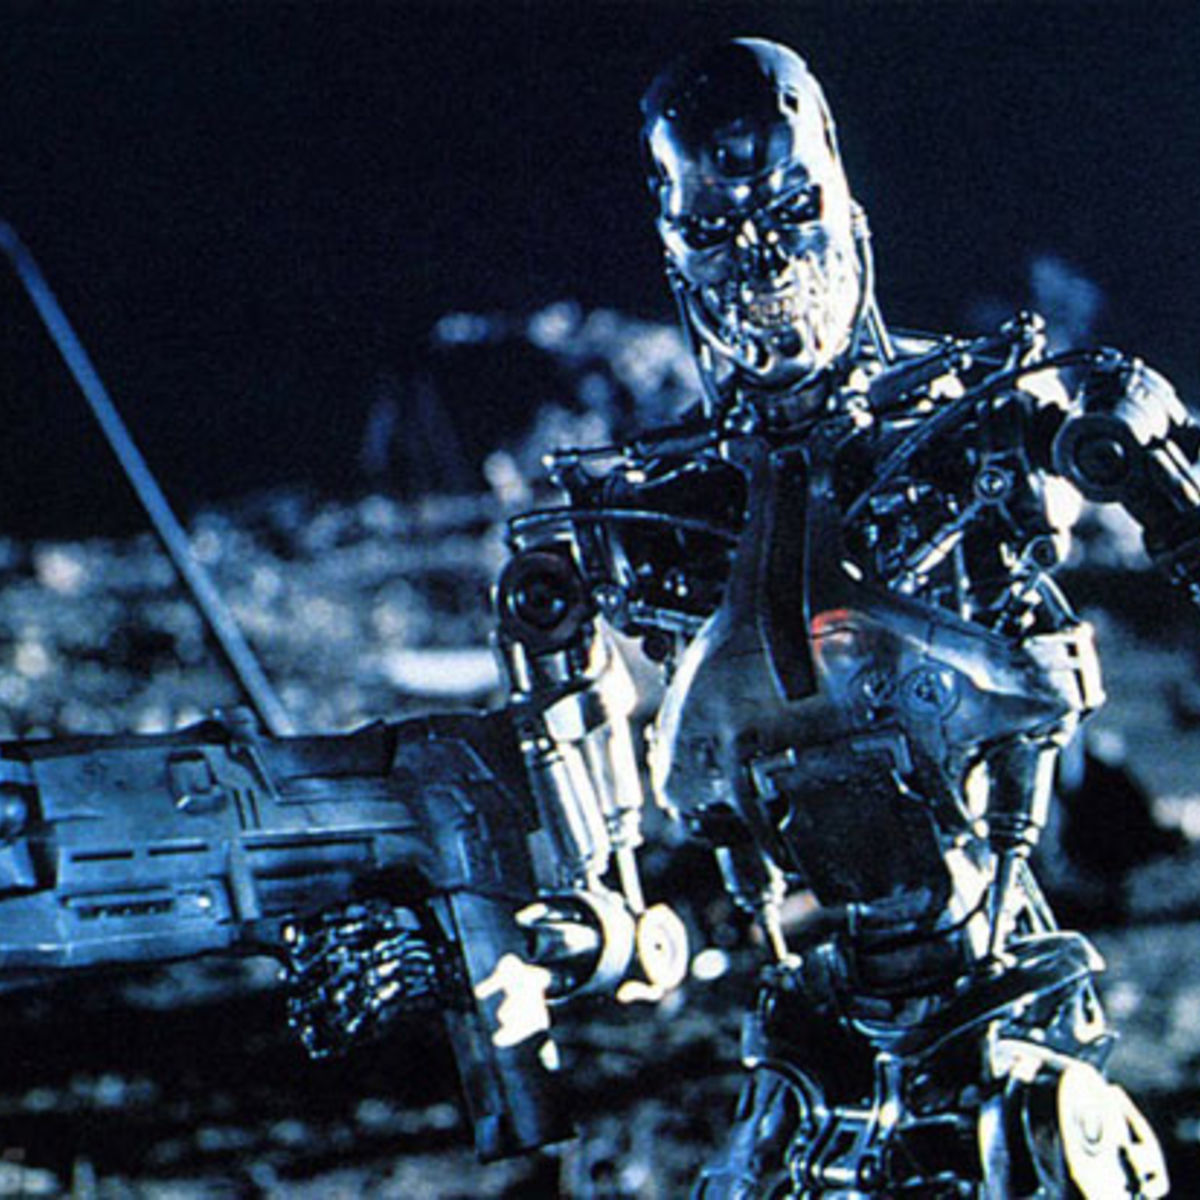 TerminatorSalvation022912.jpg